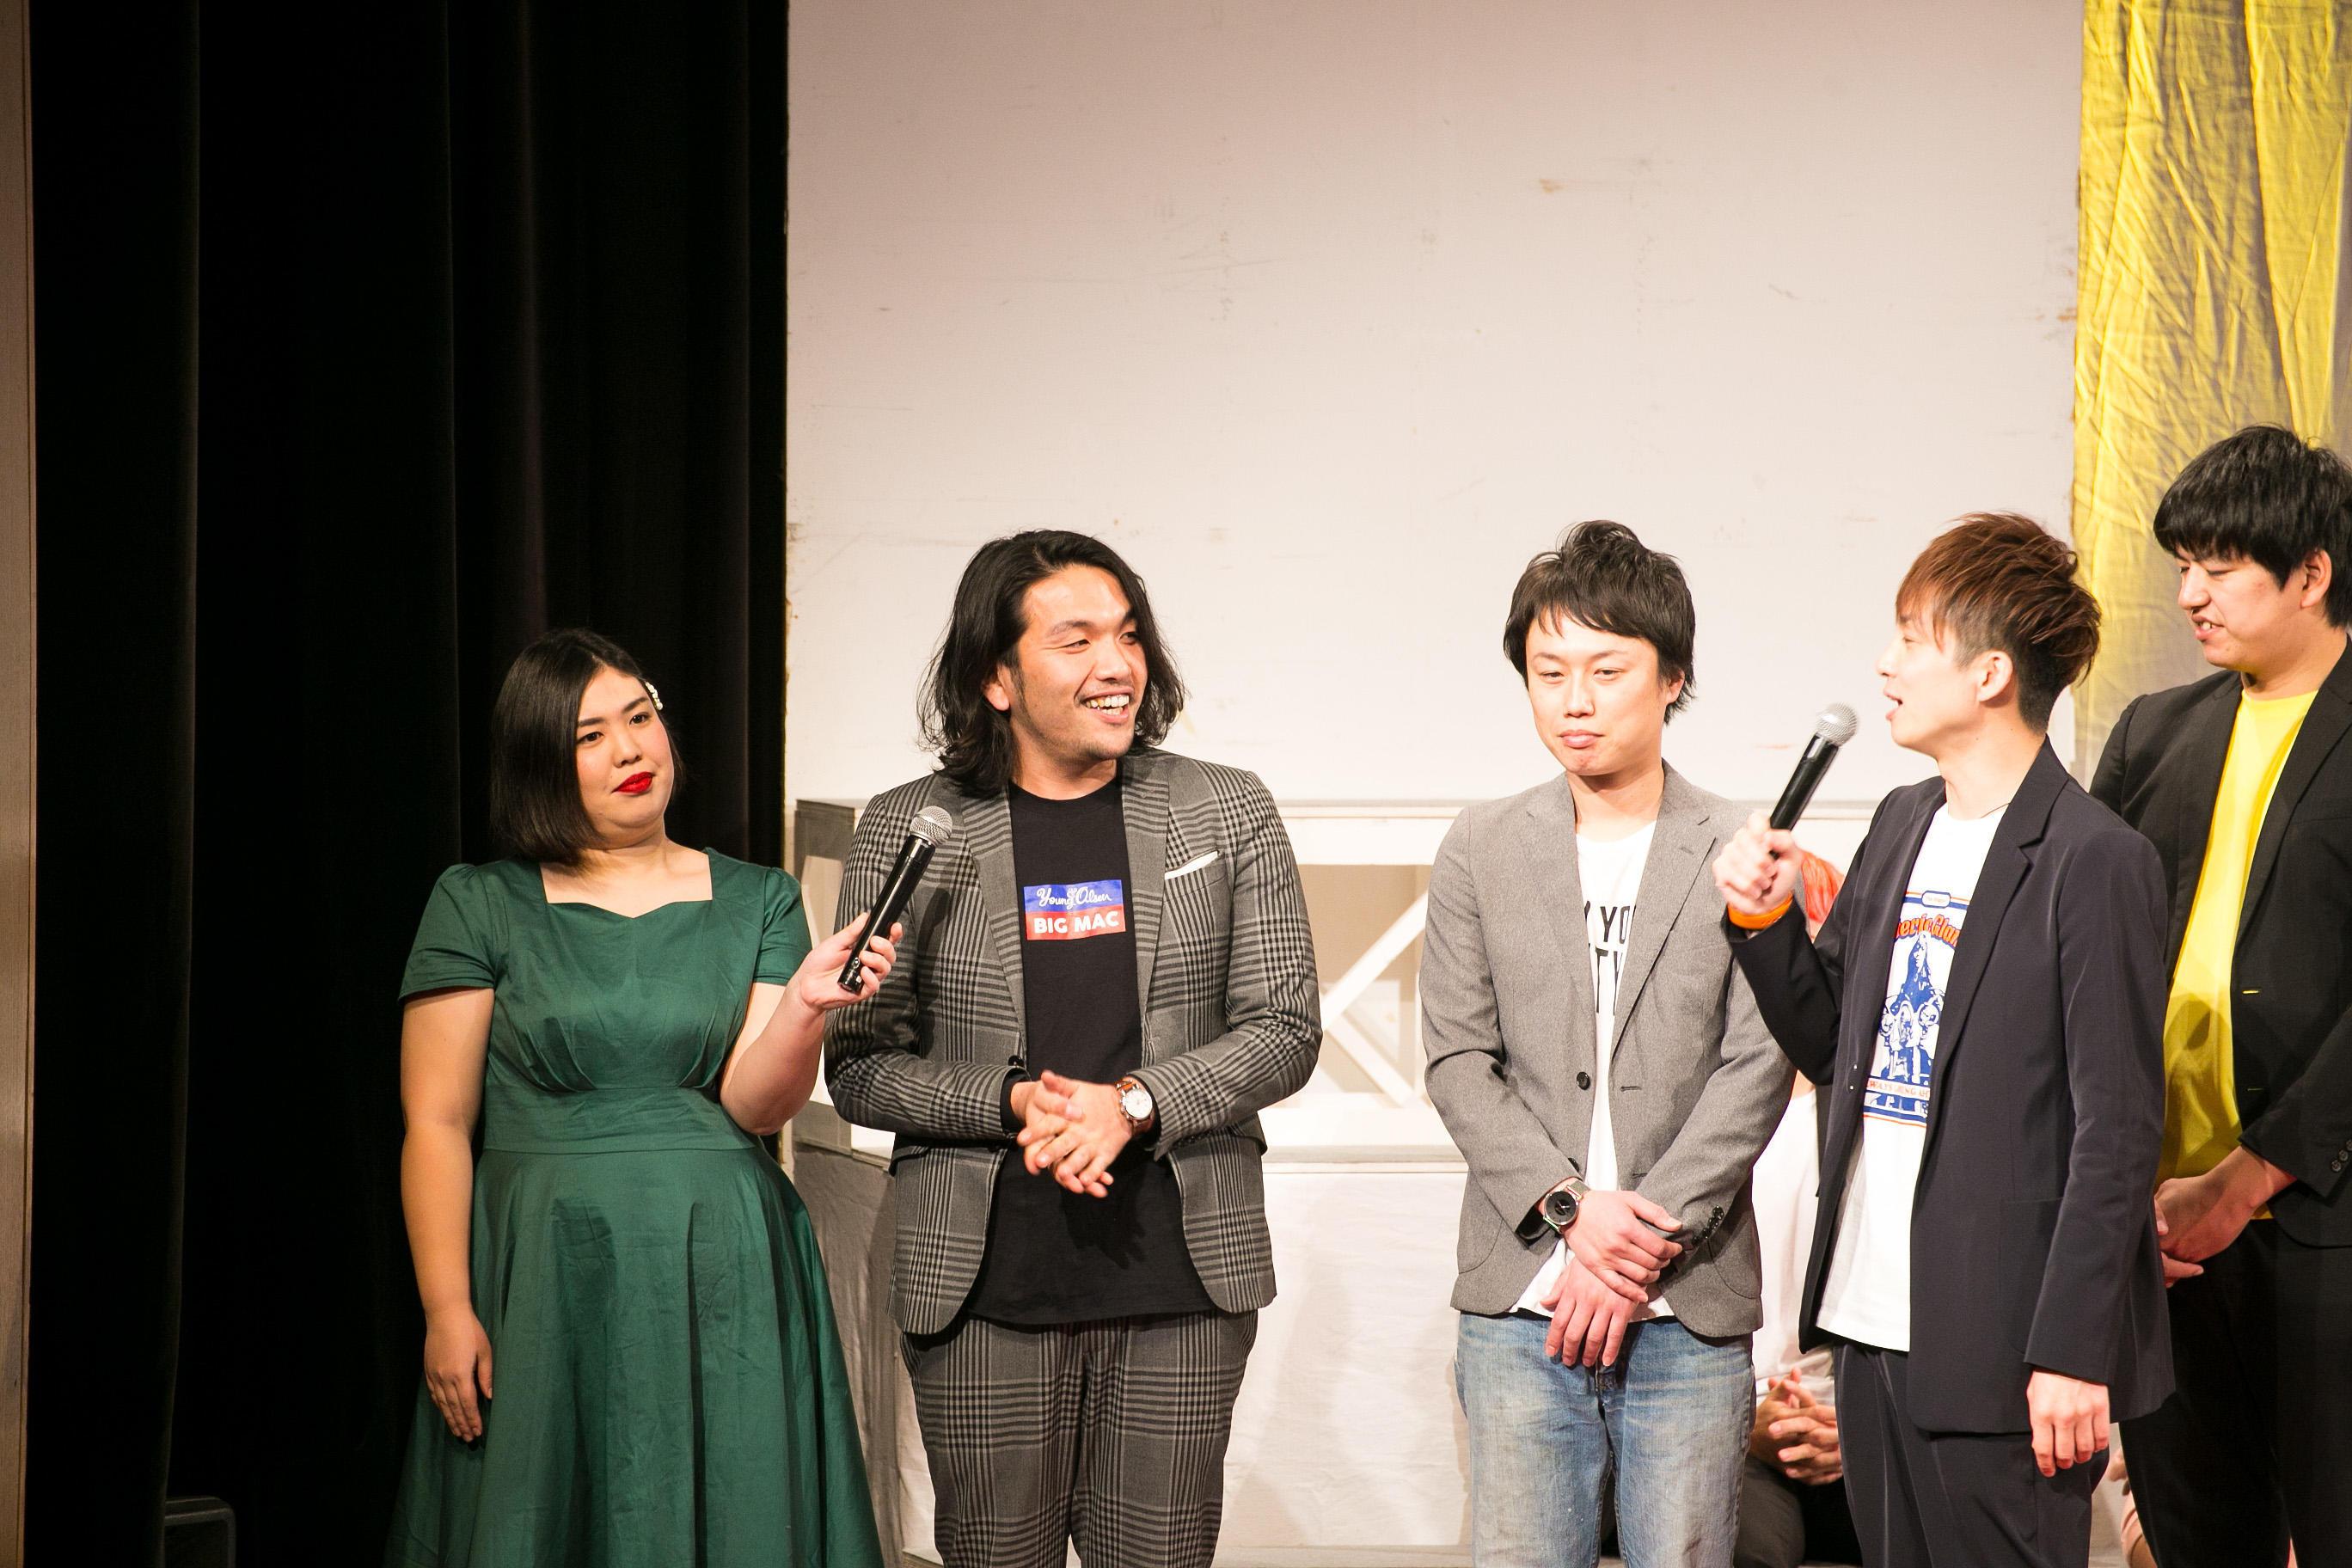 http://news.yoshimoto.co.jp/20181228111440-200f7367dcbd5eea96b129eb2dfa09ee37b88f1b.jpg